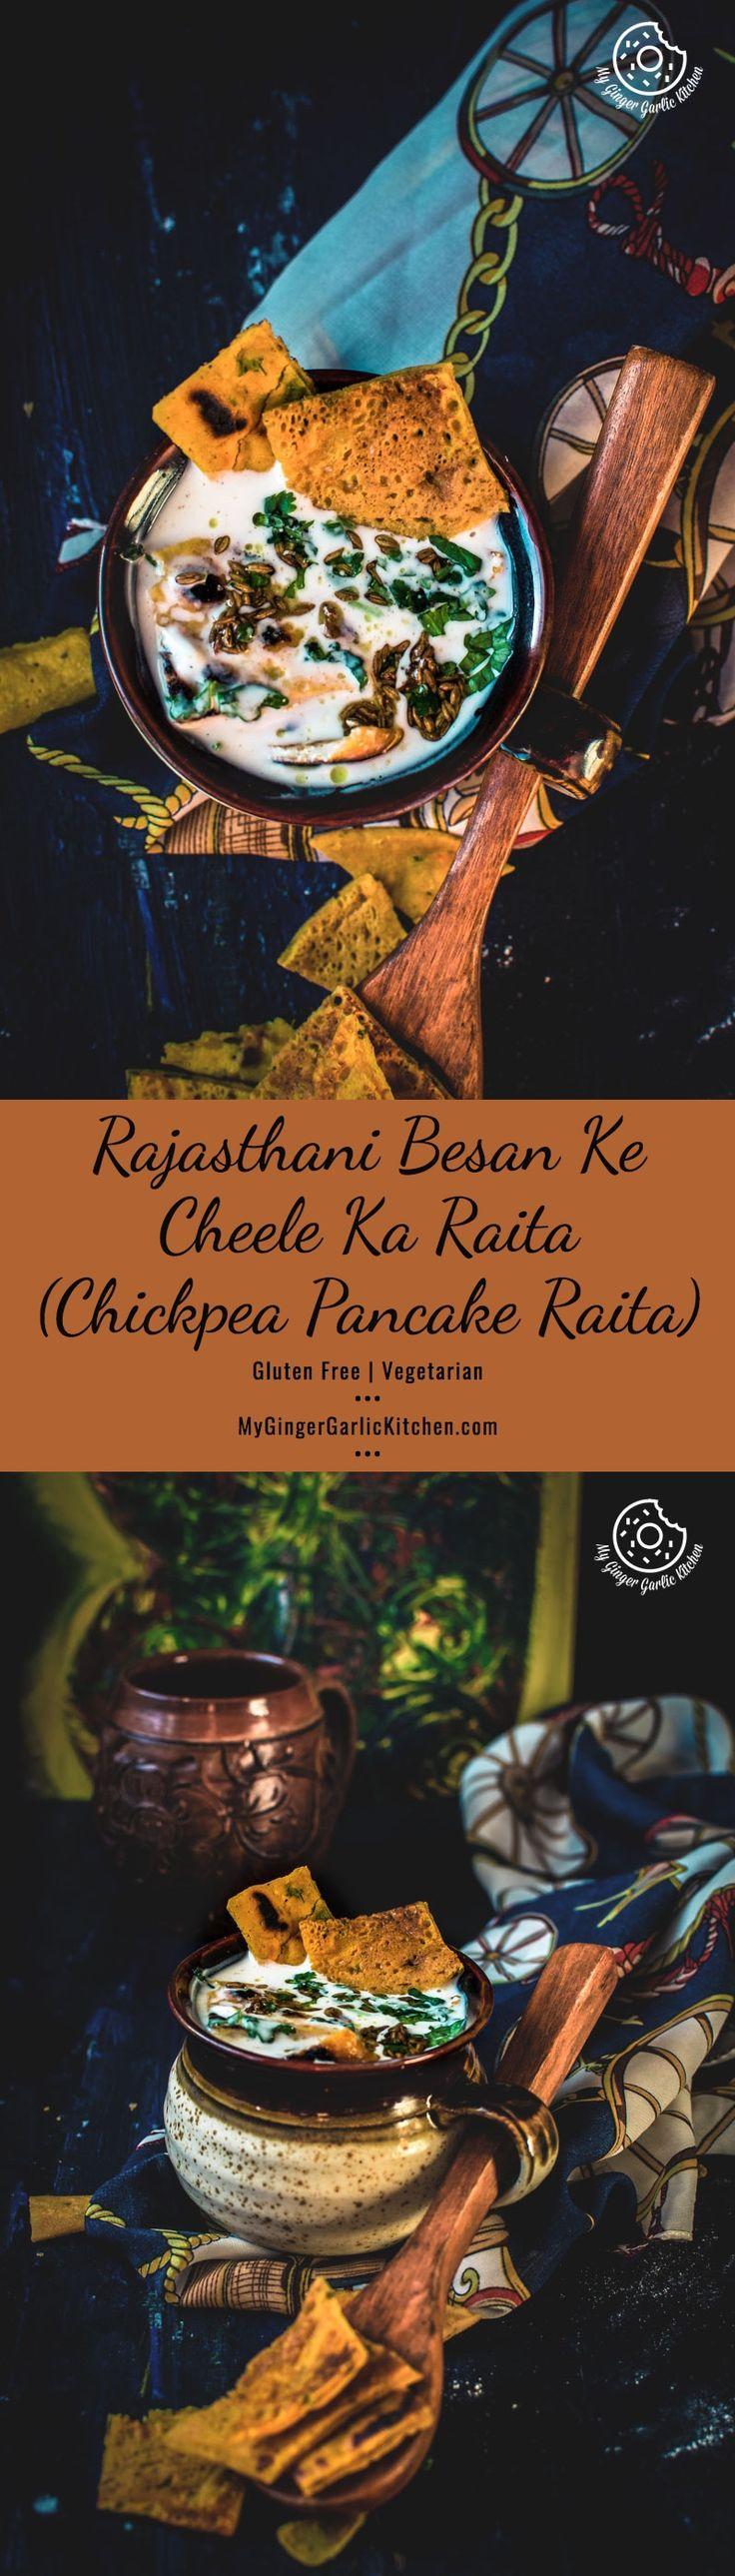 Rajasthani Besan Ke Cheele Ka Raita | Chickpea Pancake Raita. In this raita, chickpea flour pancakes are dunked into chilled spiced yogurt base and later tempered with cumin seeds and asafetida. From: mygingergarlickitchen.com #Glutenfree #Vegetarian #Raita #Besan #Indiancuisine #Indianrecipes